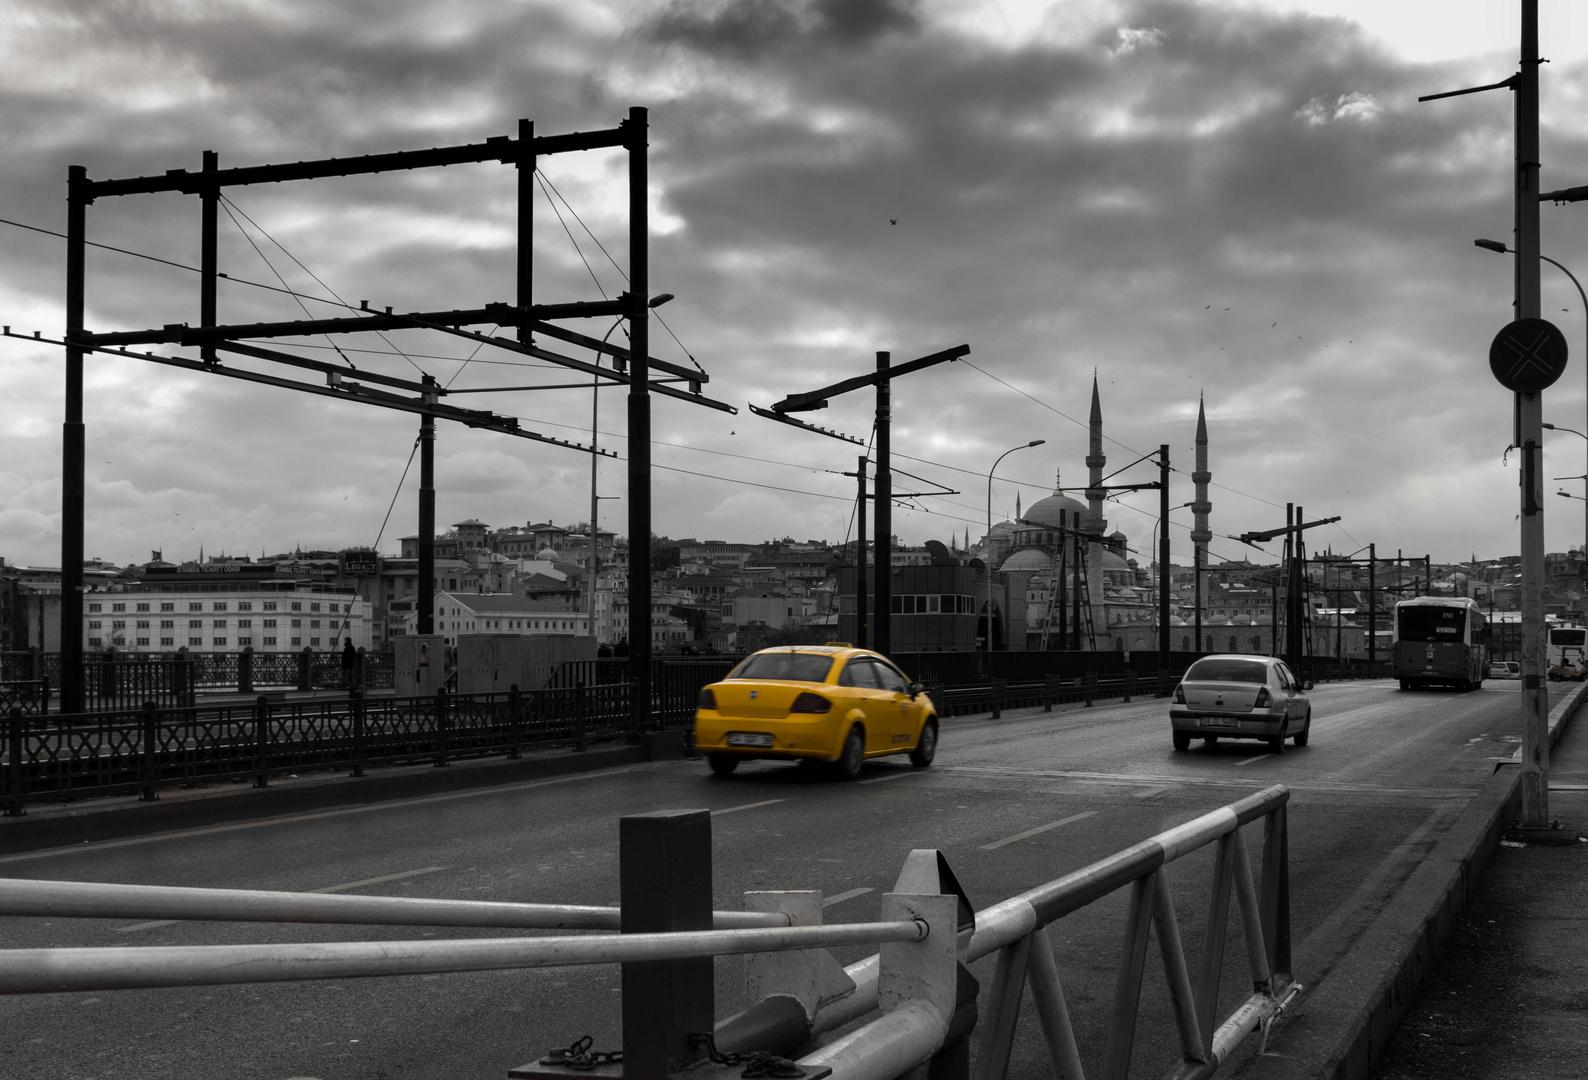 Taxi on the Bridge